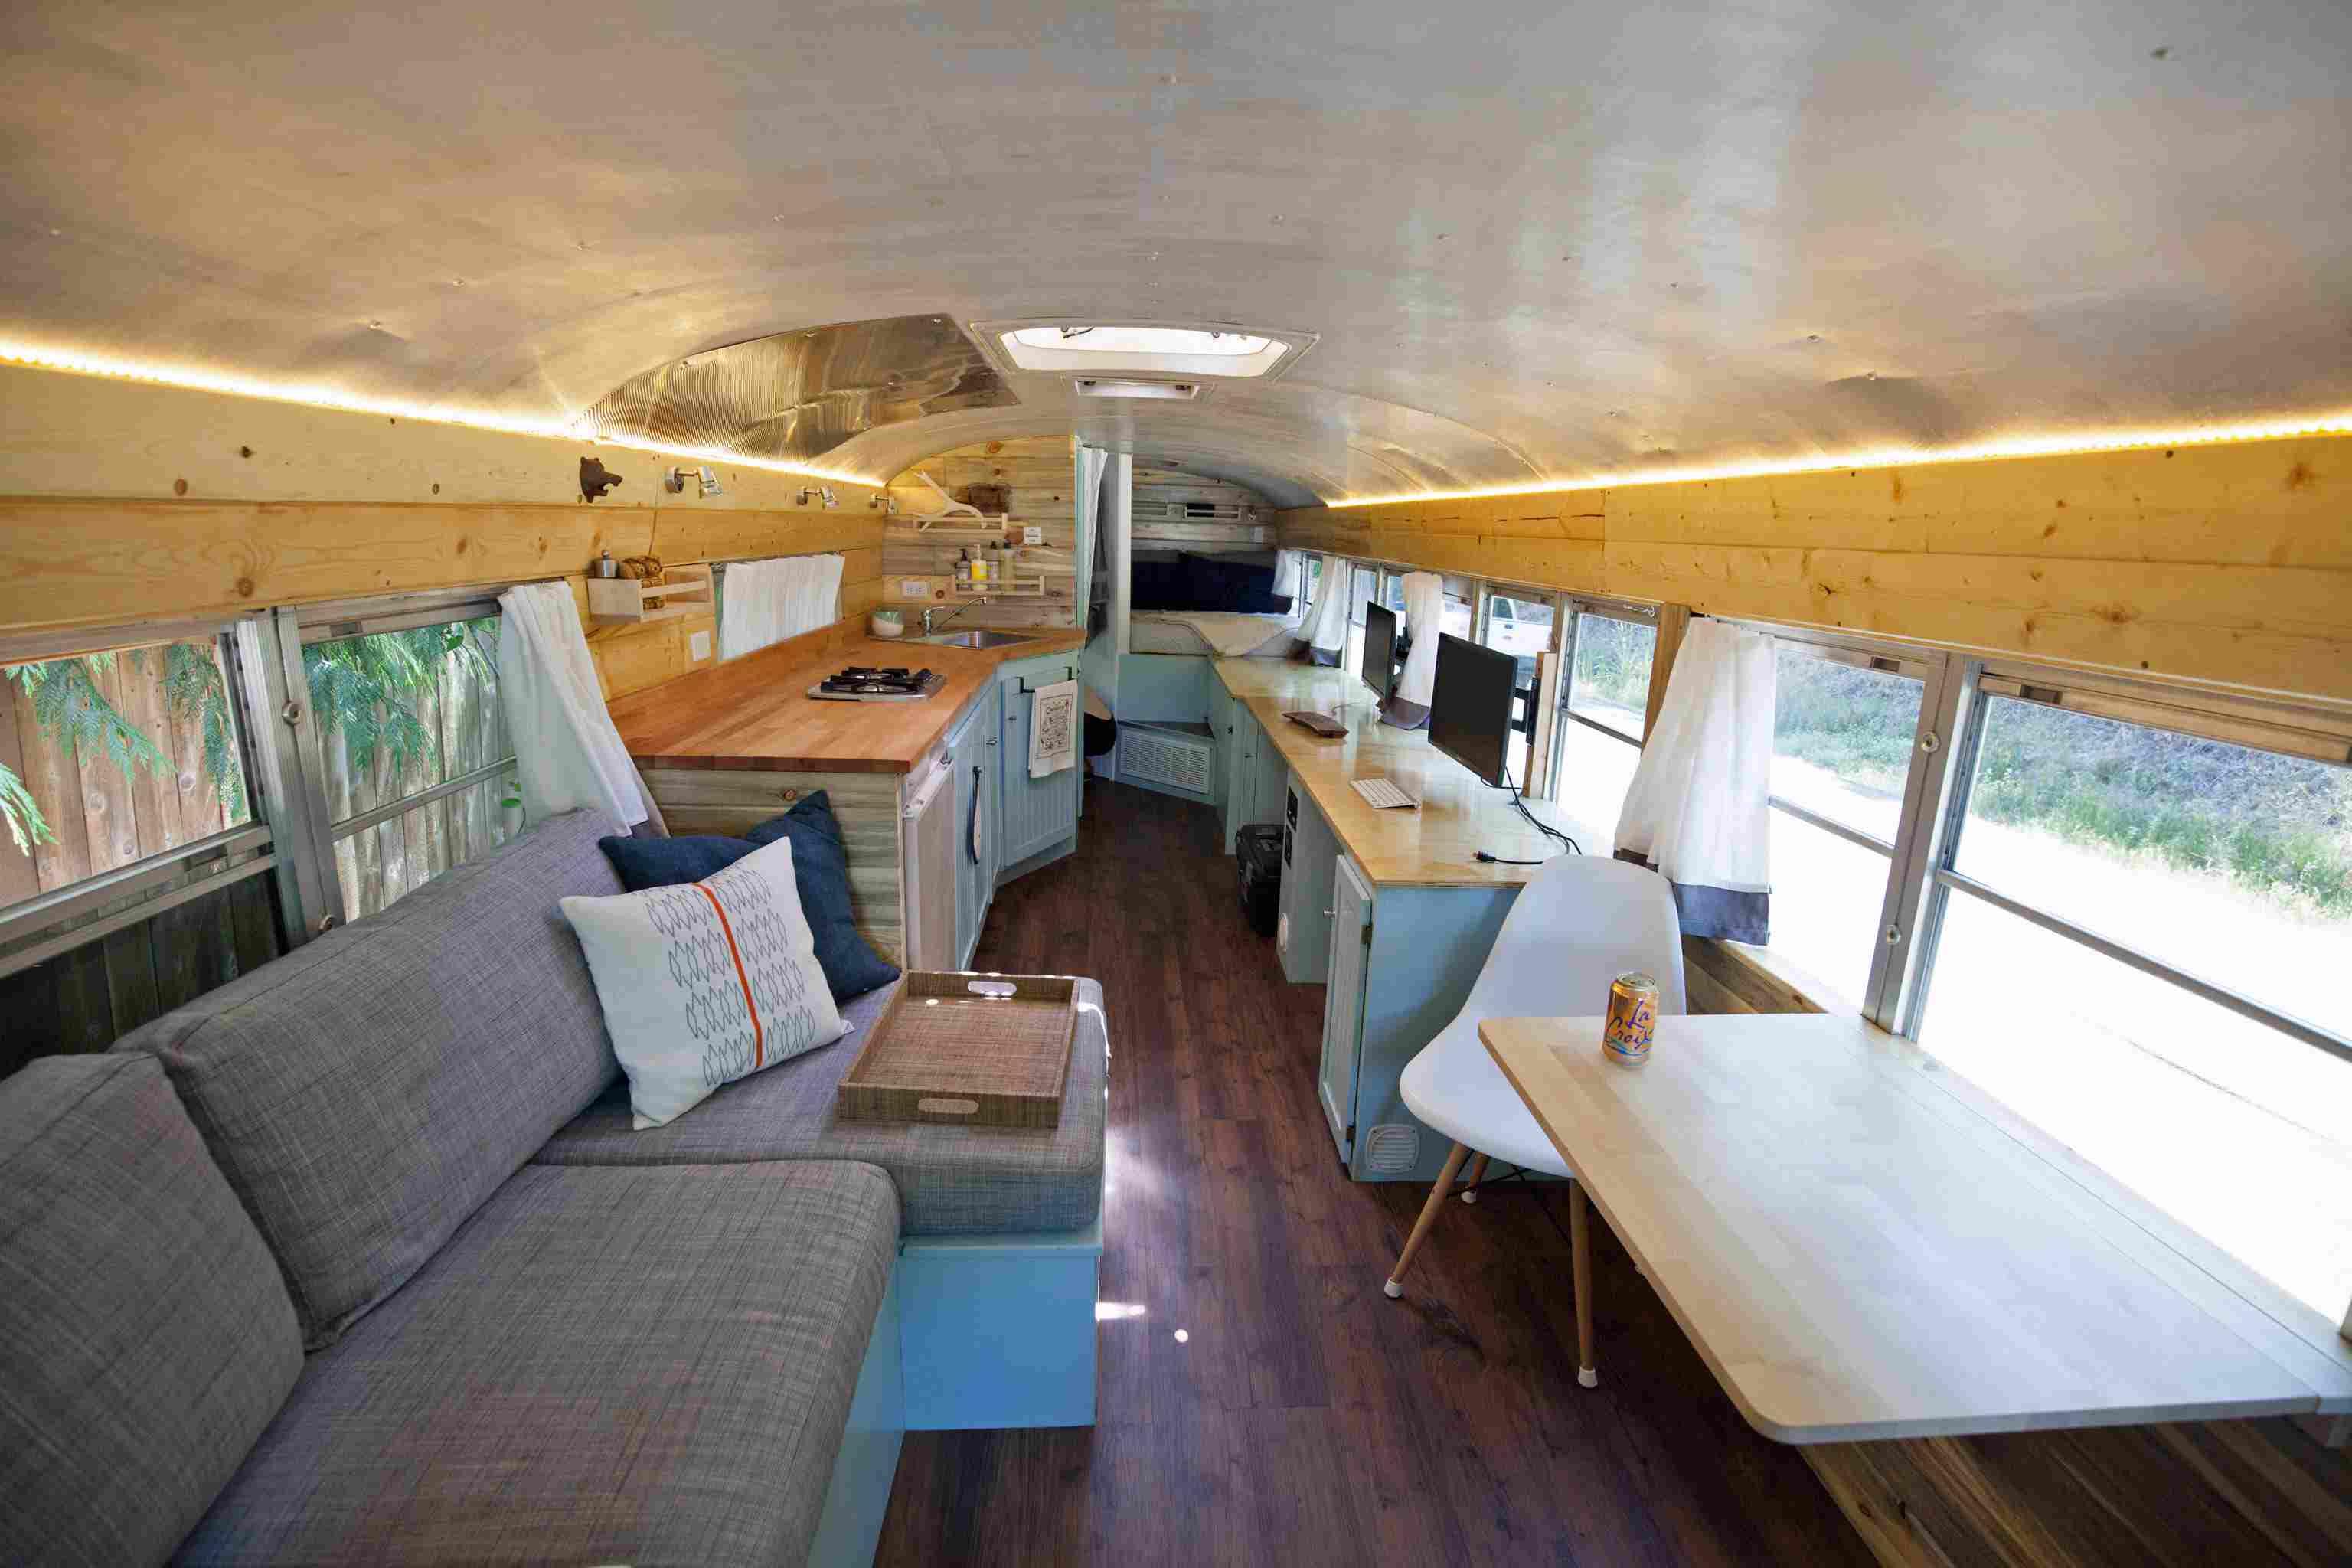 Bus living room